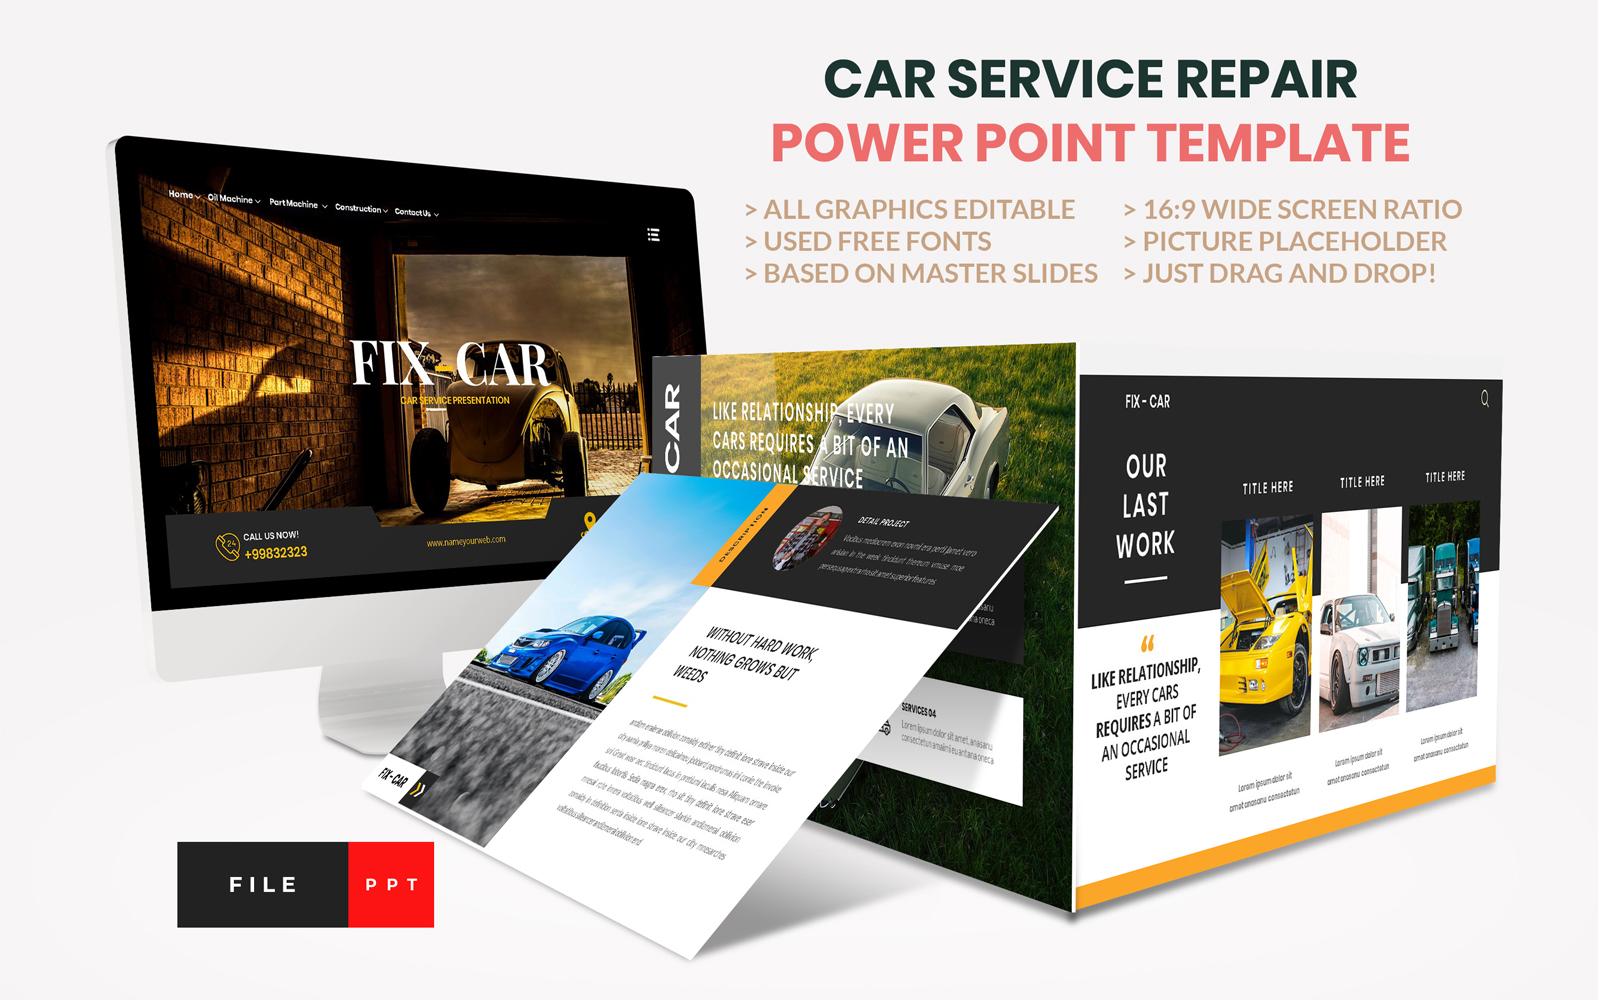 Car Repair Service PowerPoint Template